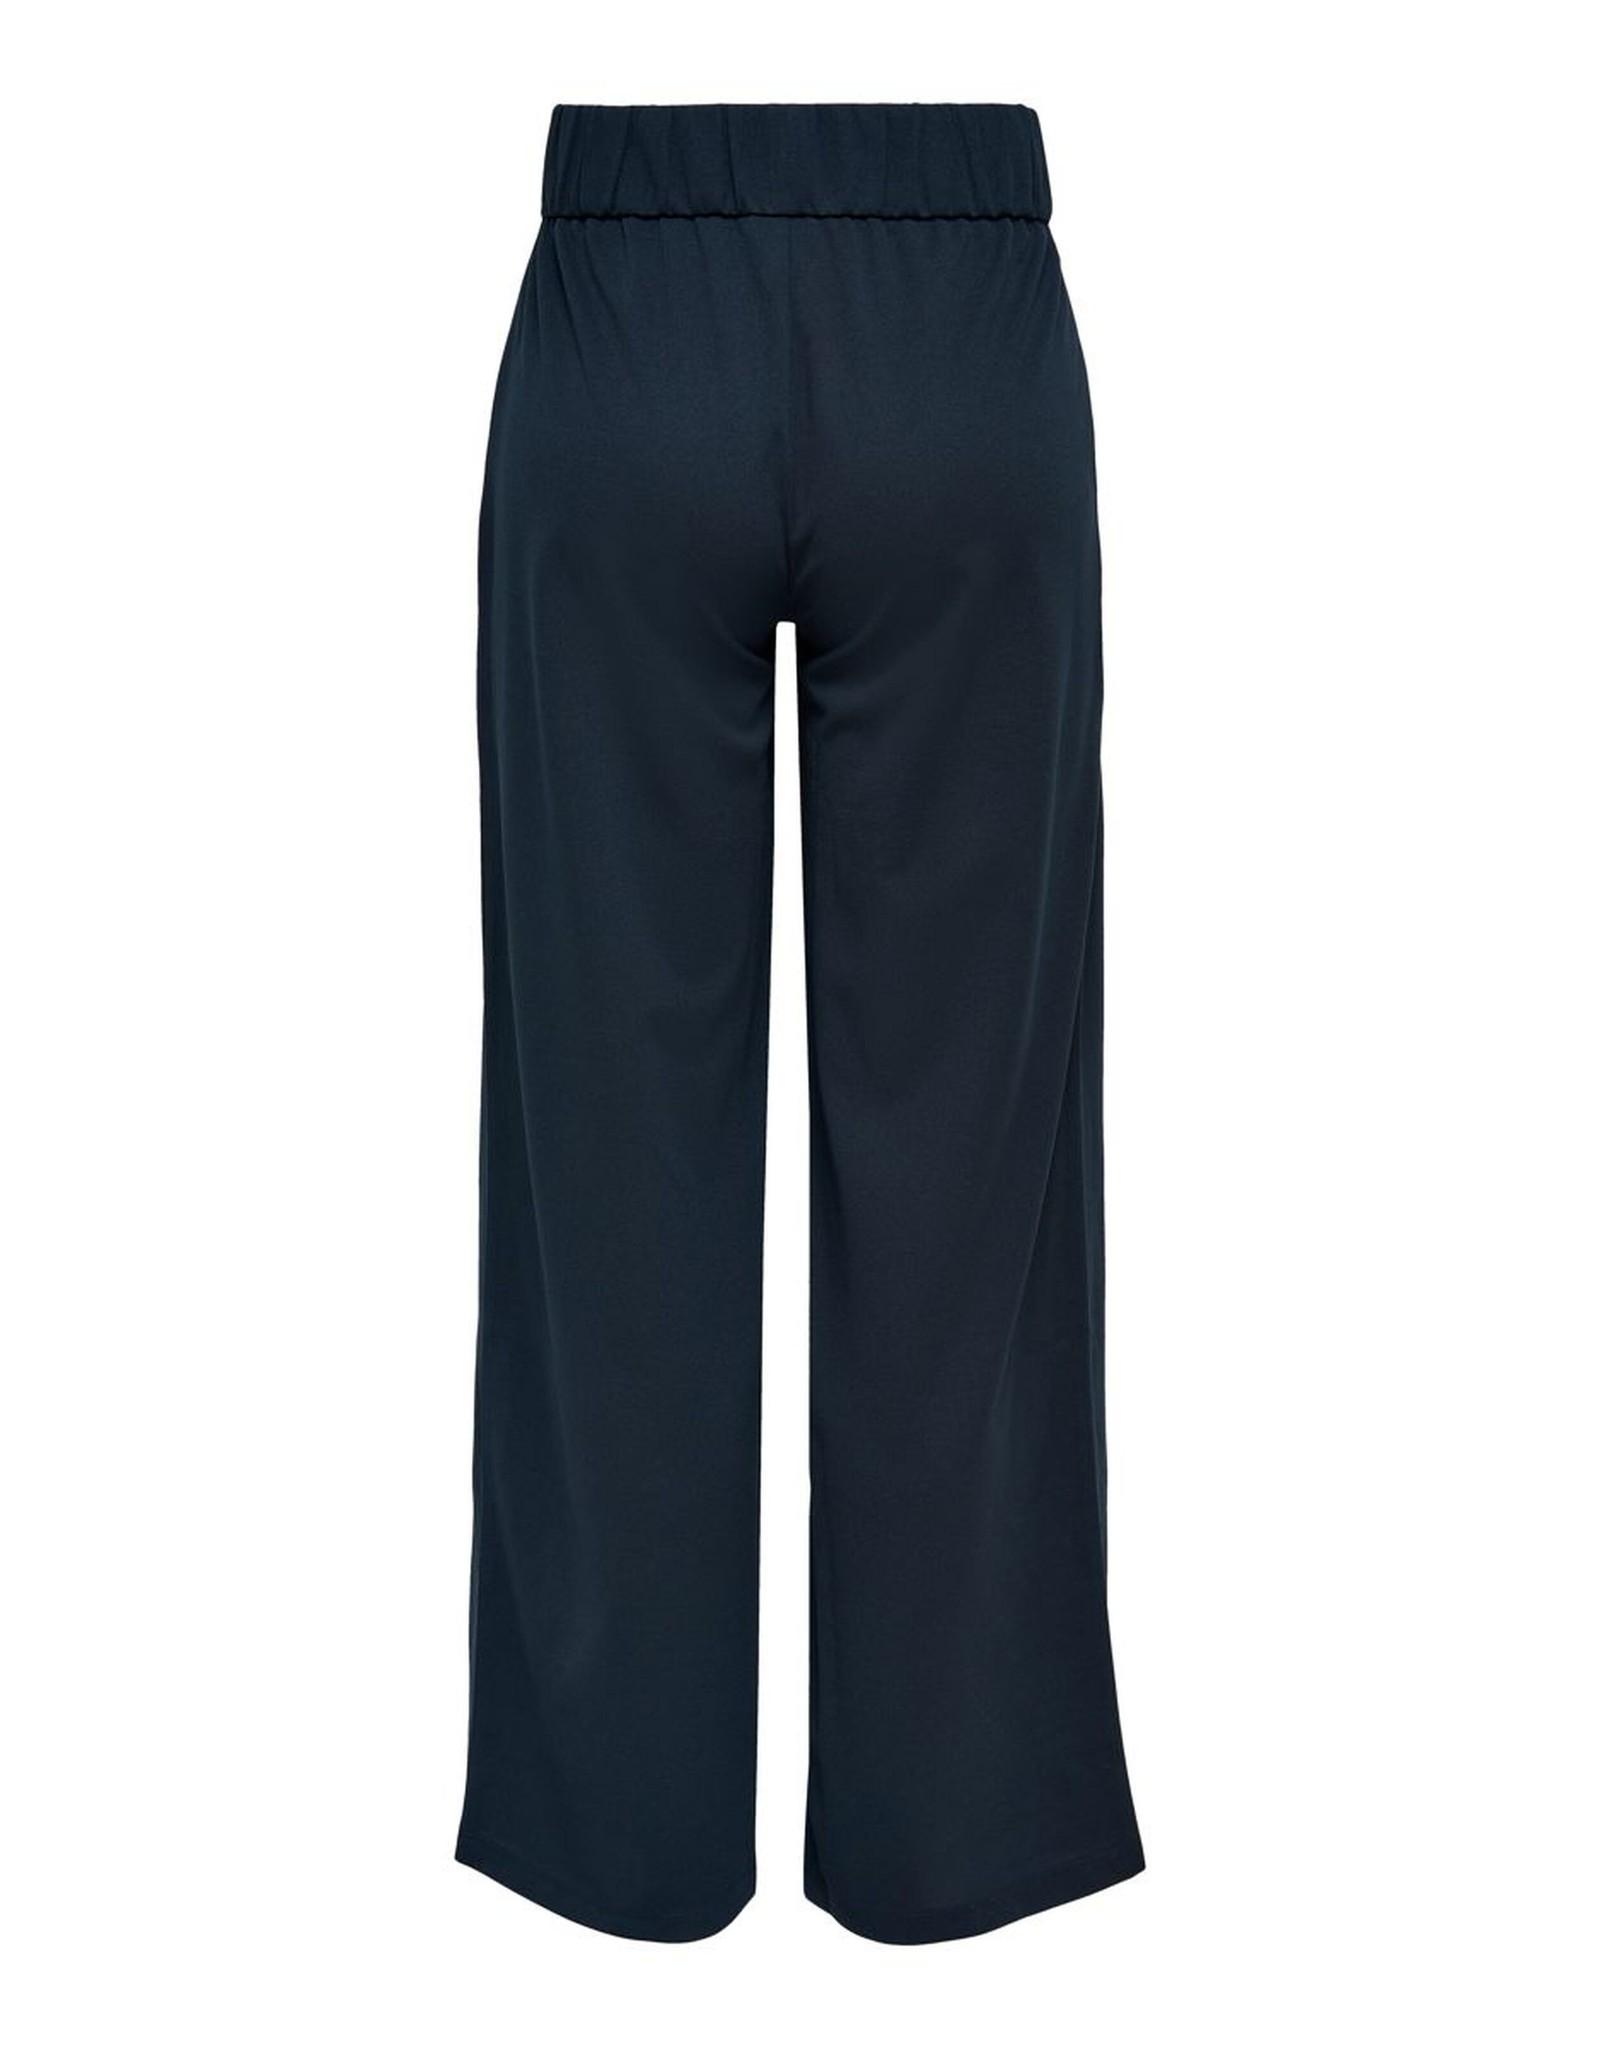 LOUISVILLE PANTS BLUE